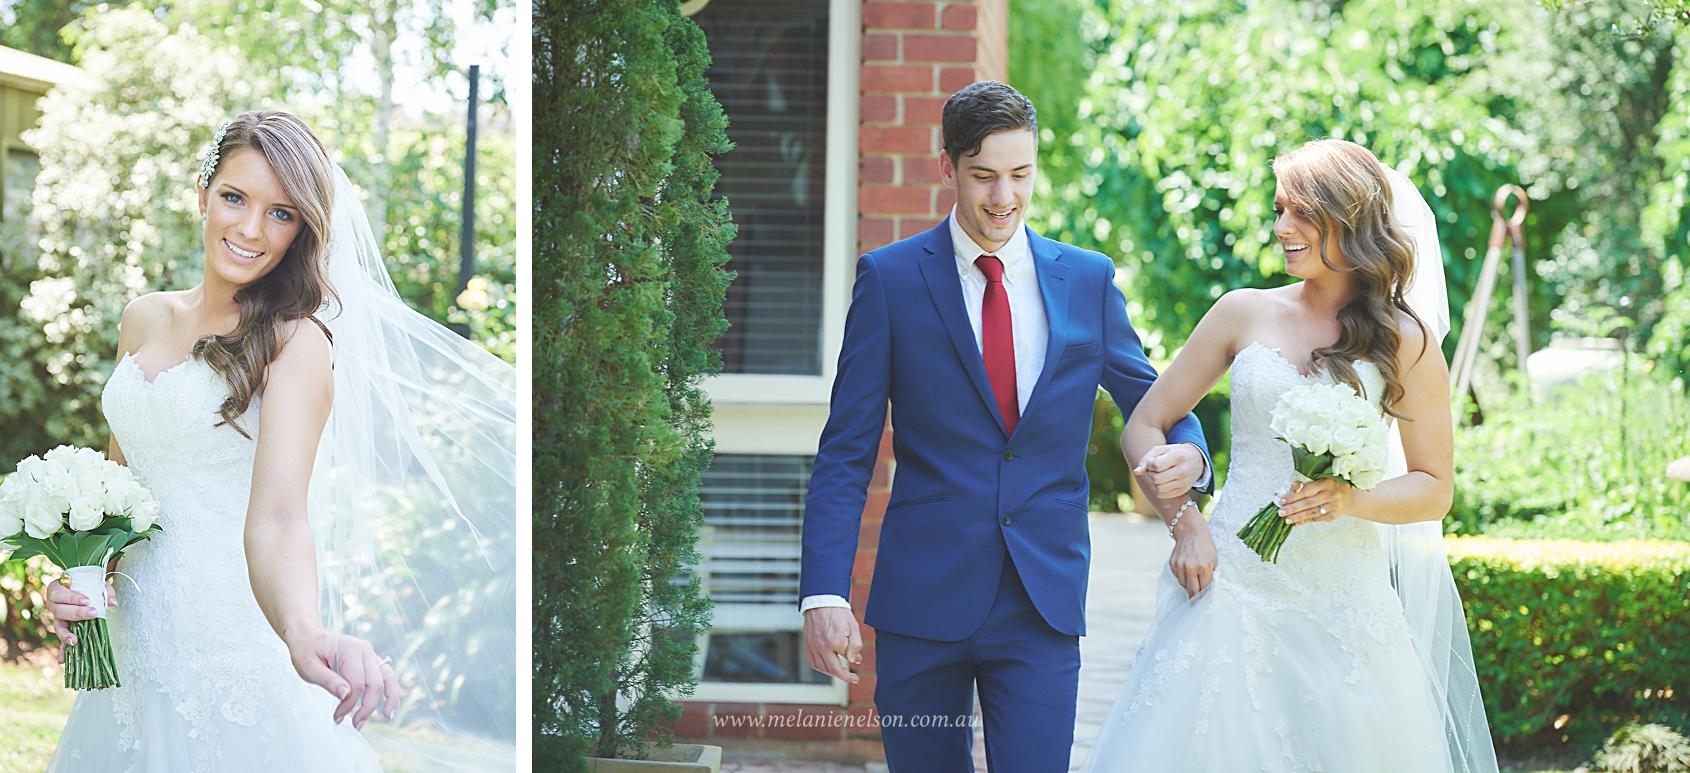 adelaide_wedding_photographer_012.jpg